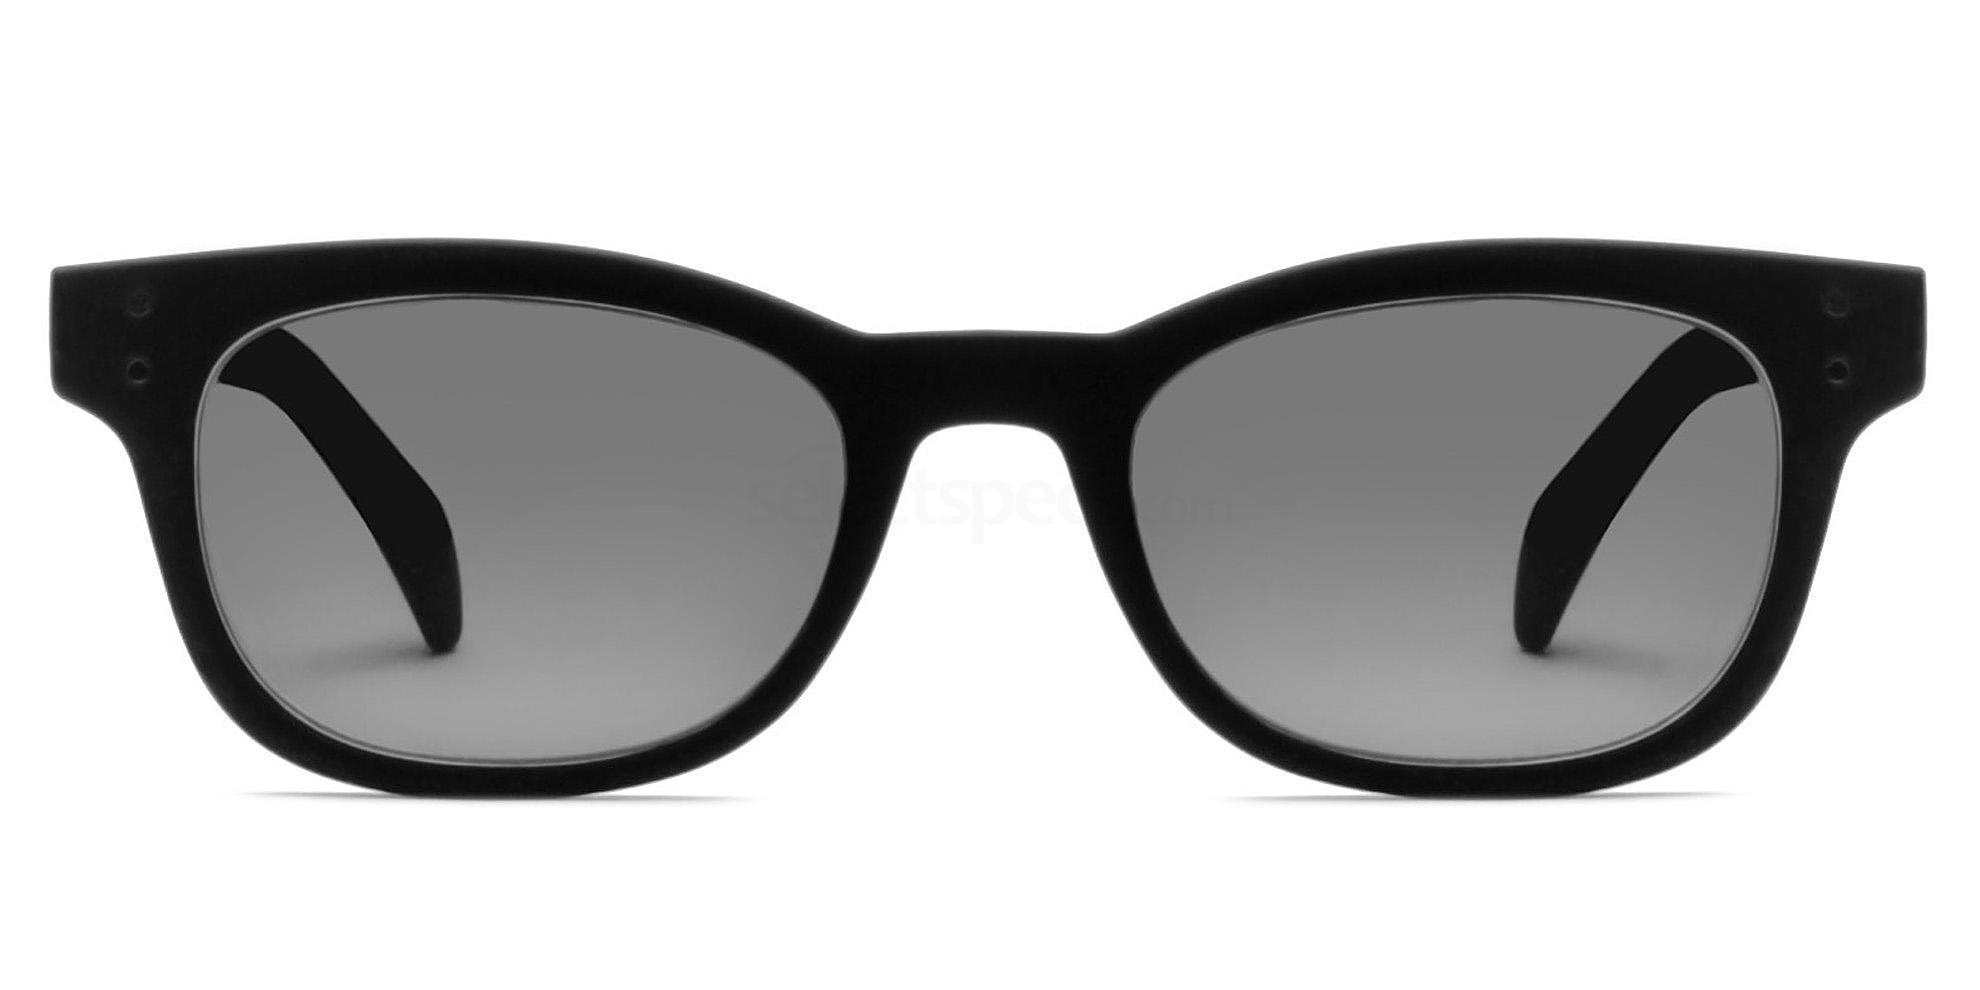 C02 Polarized Grey 2249 - Matte Black (Polarized) Sunglasses, Savannah